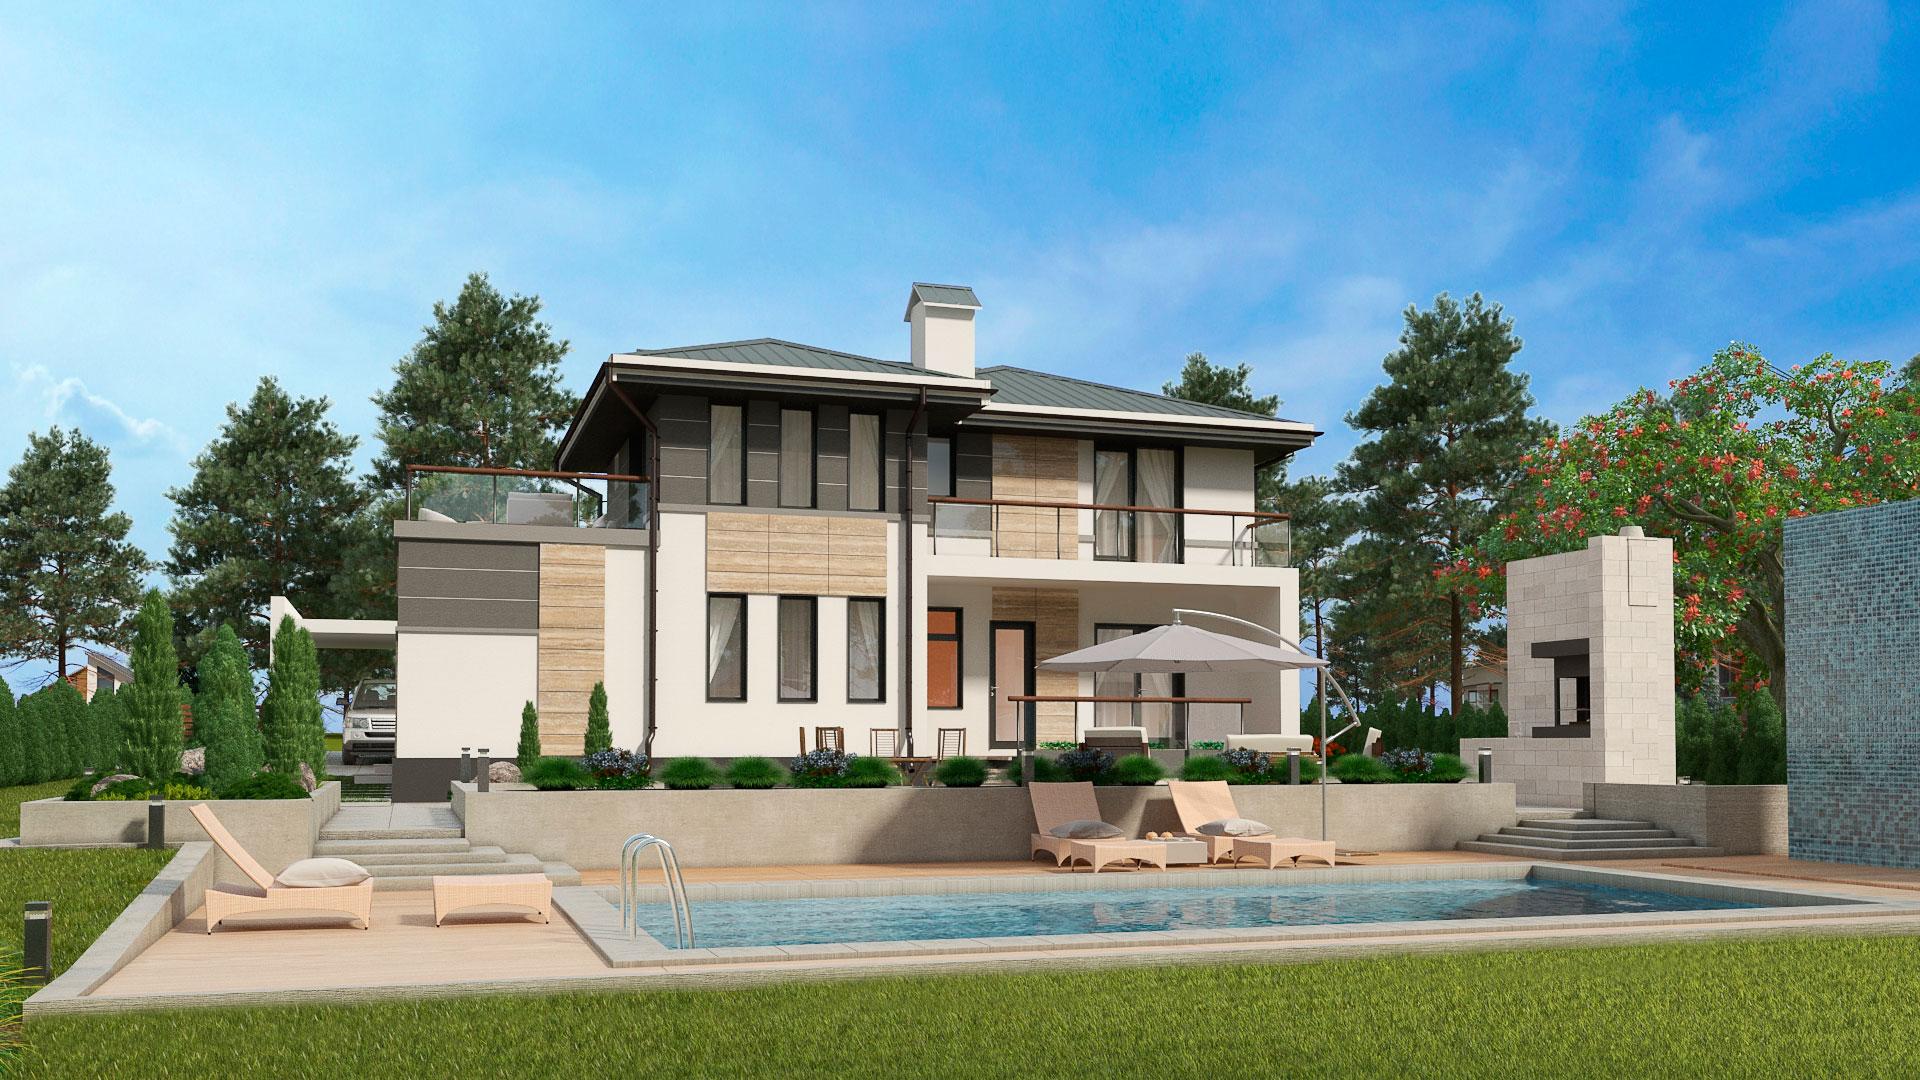 Задний фасад двухэтажного дома БЭНПАН, проект МС-224.